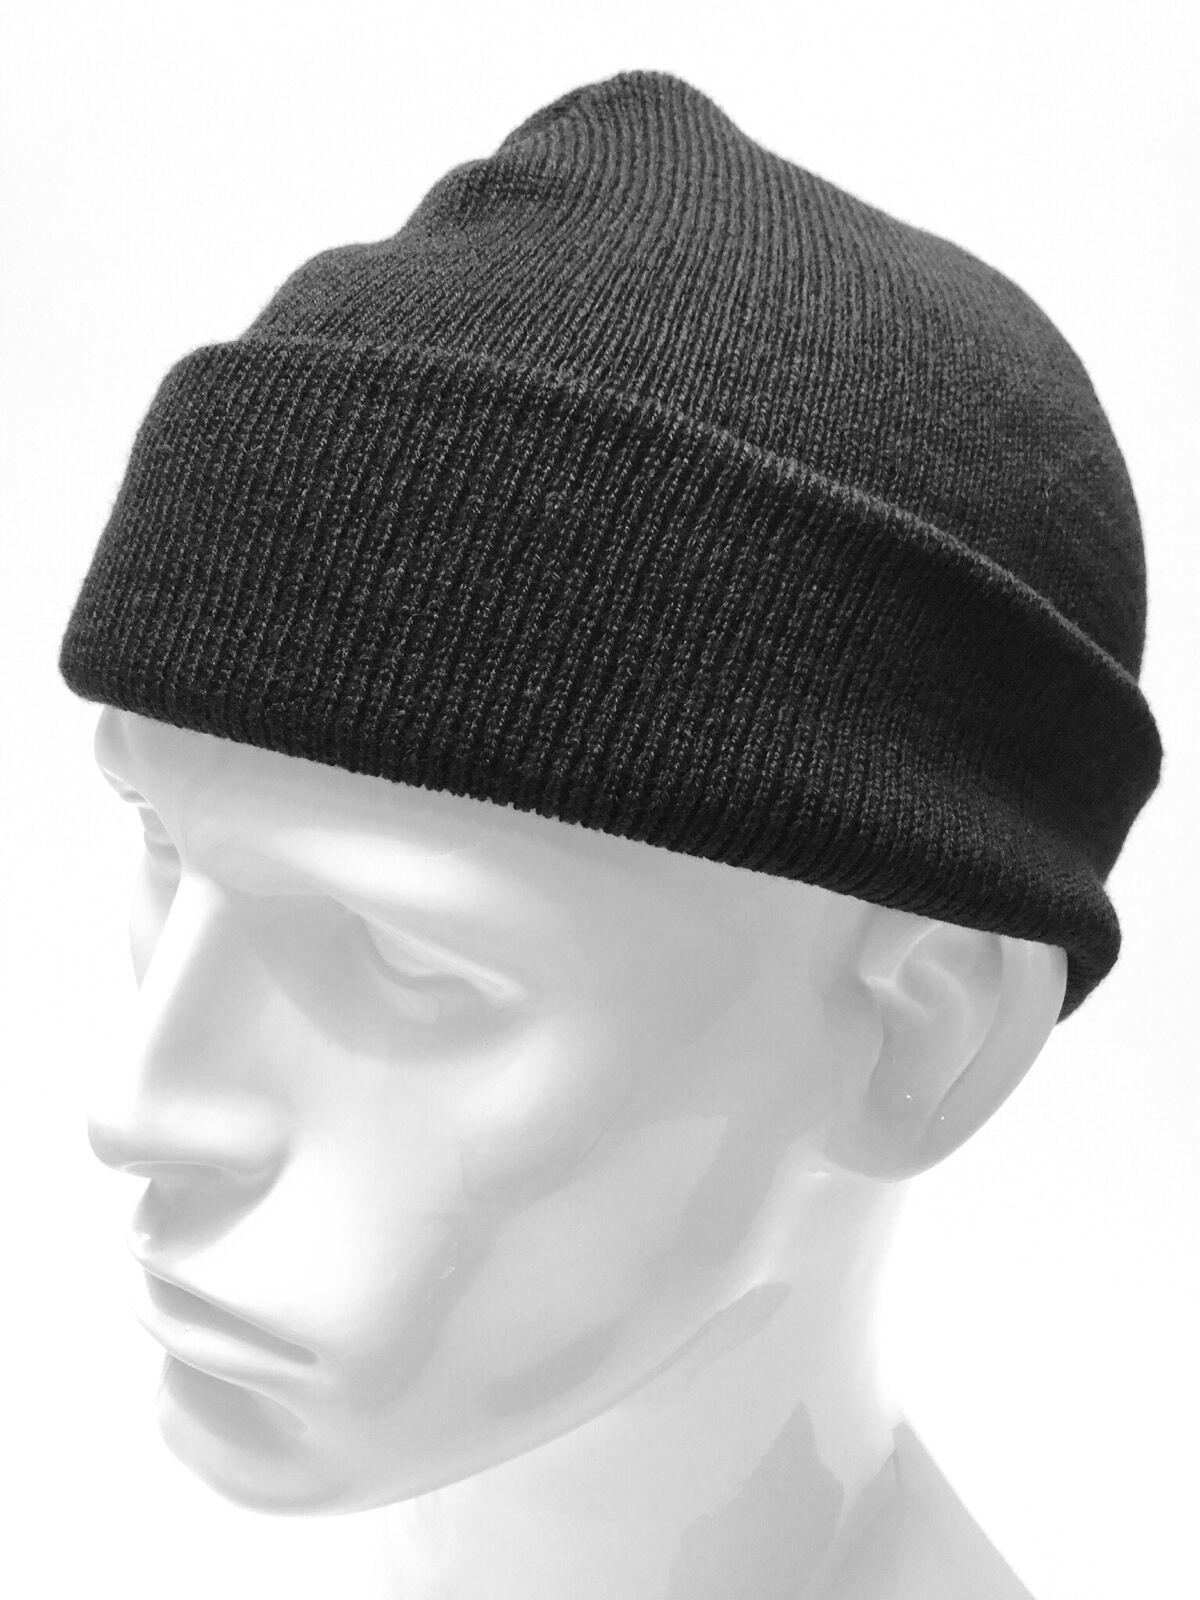 645c60ef5d6 Retro Black Mens Bob Knitted Beanie Hat Cap Military Army Commando ...